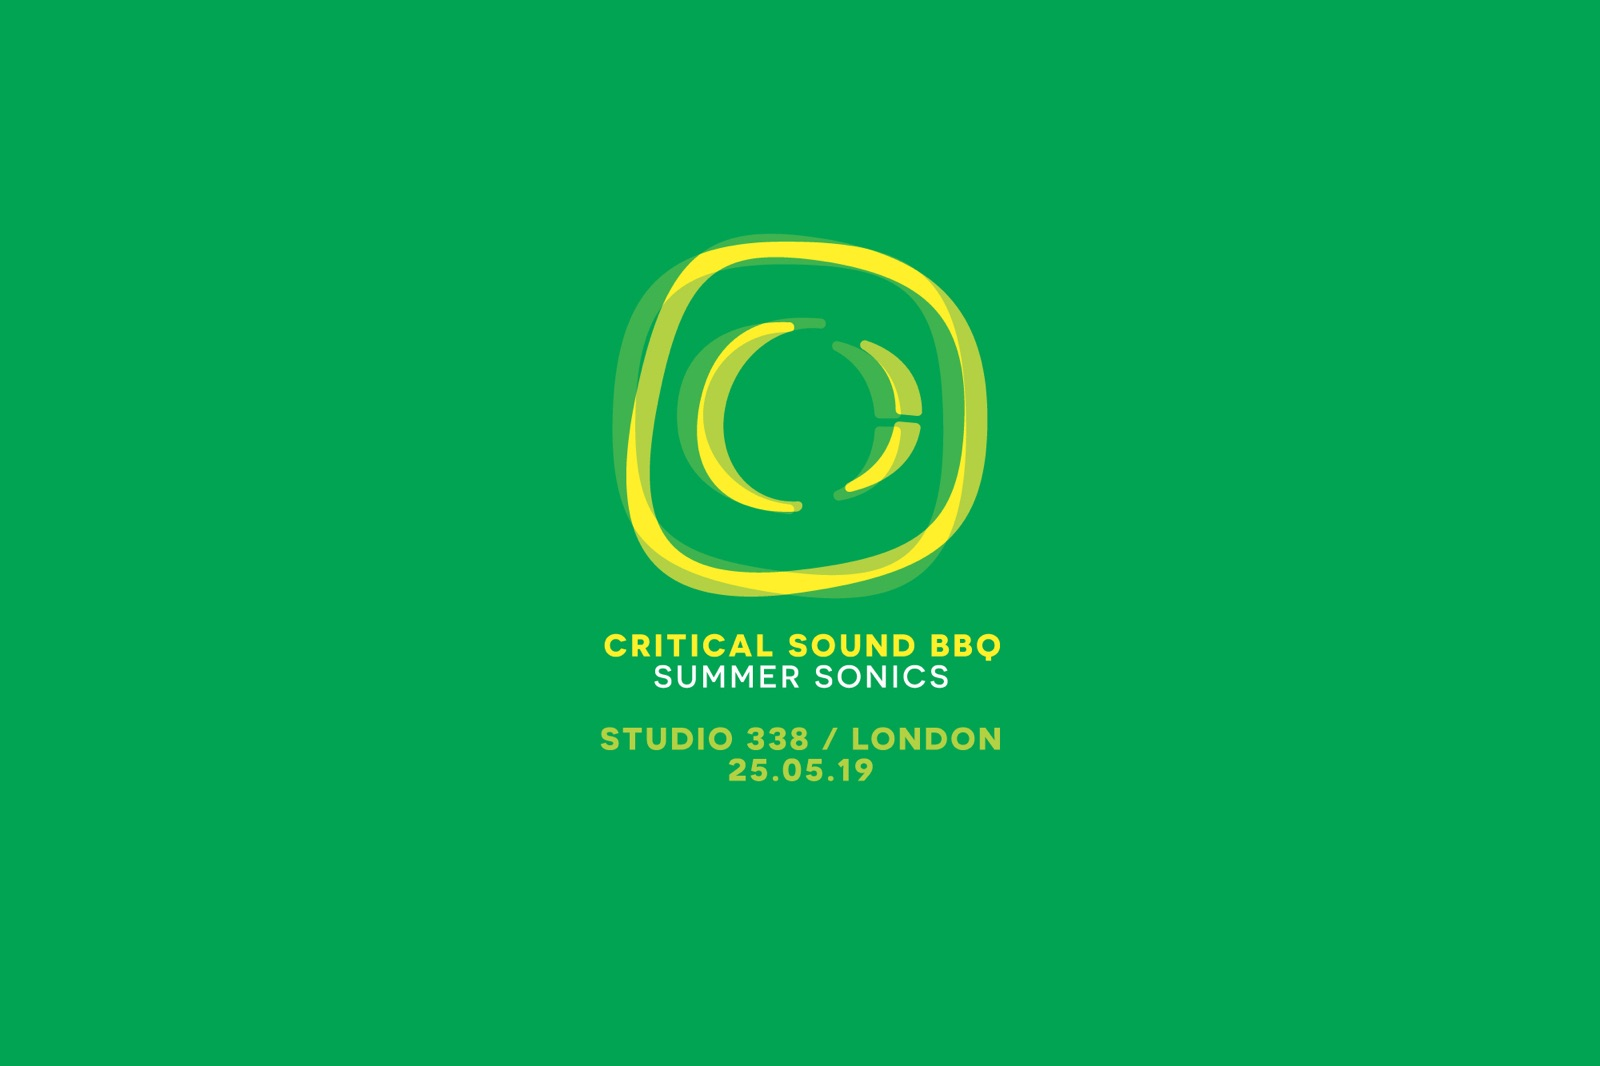 Critical Sound BBQ